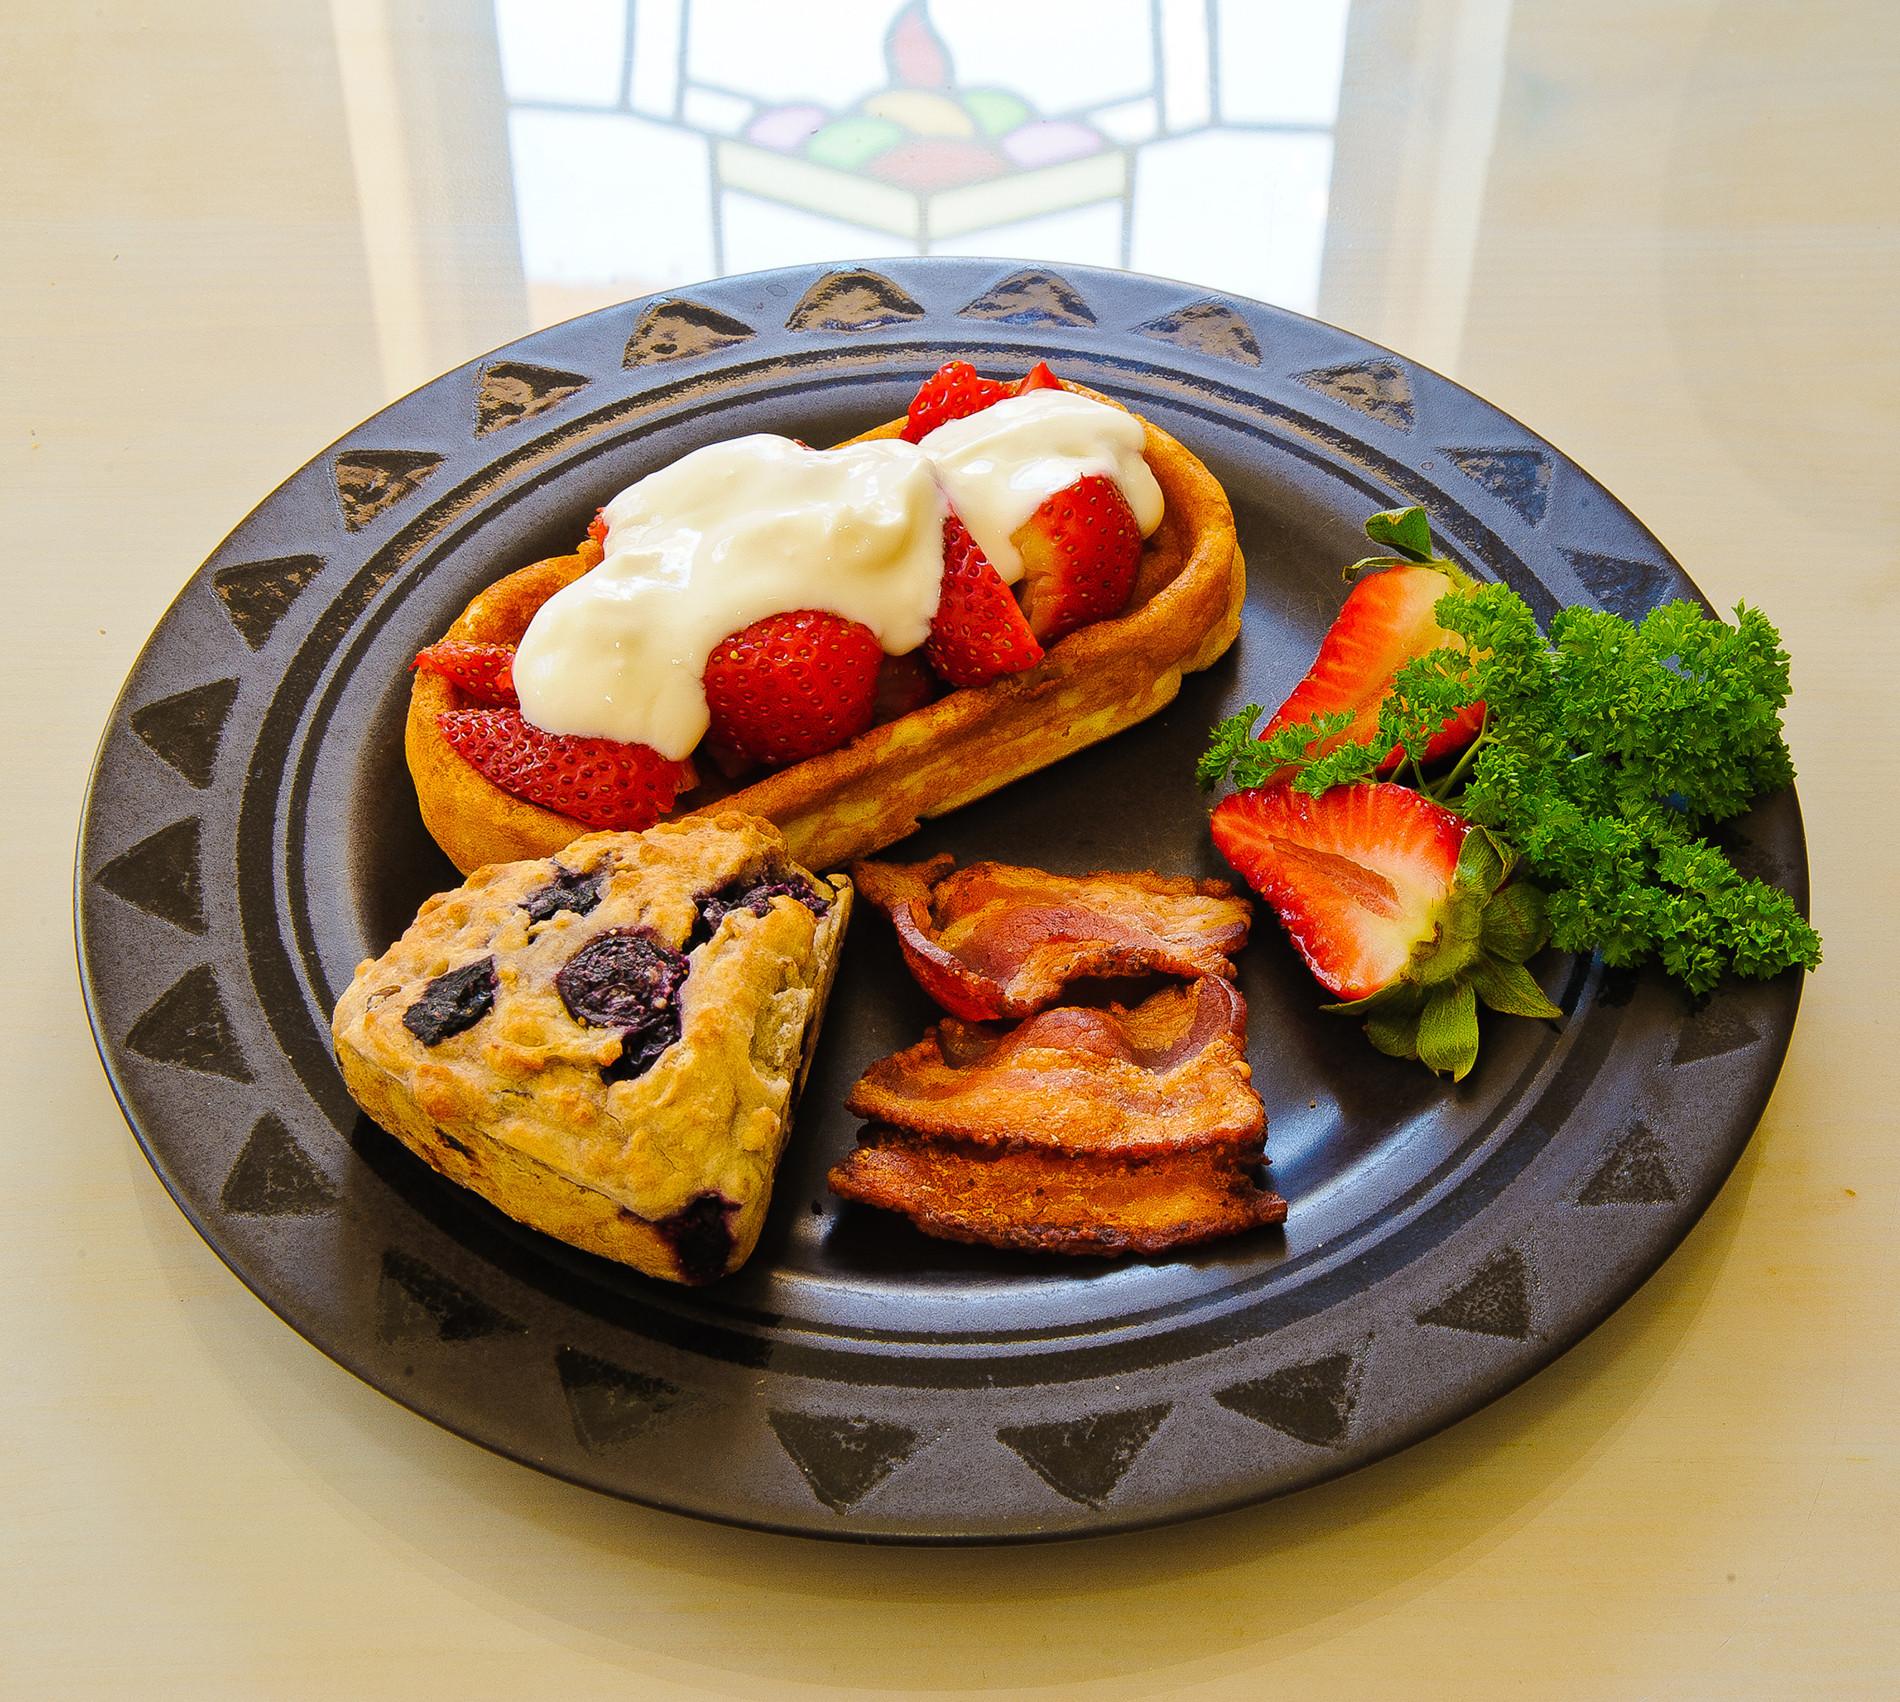 Healthy Breakfast Tucson  Bed & Breakfast Recipes